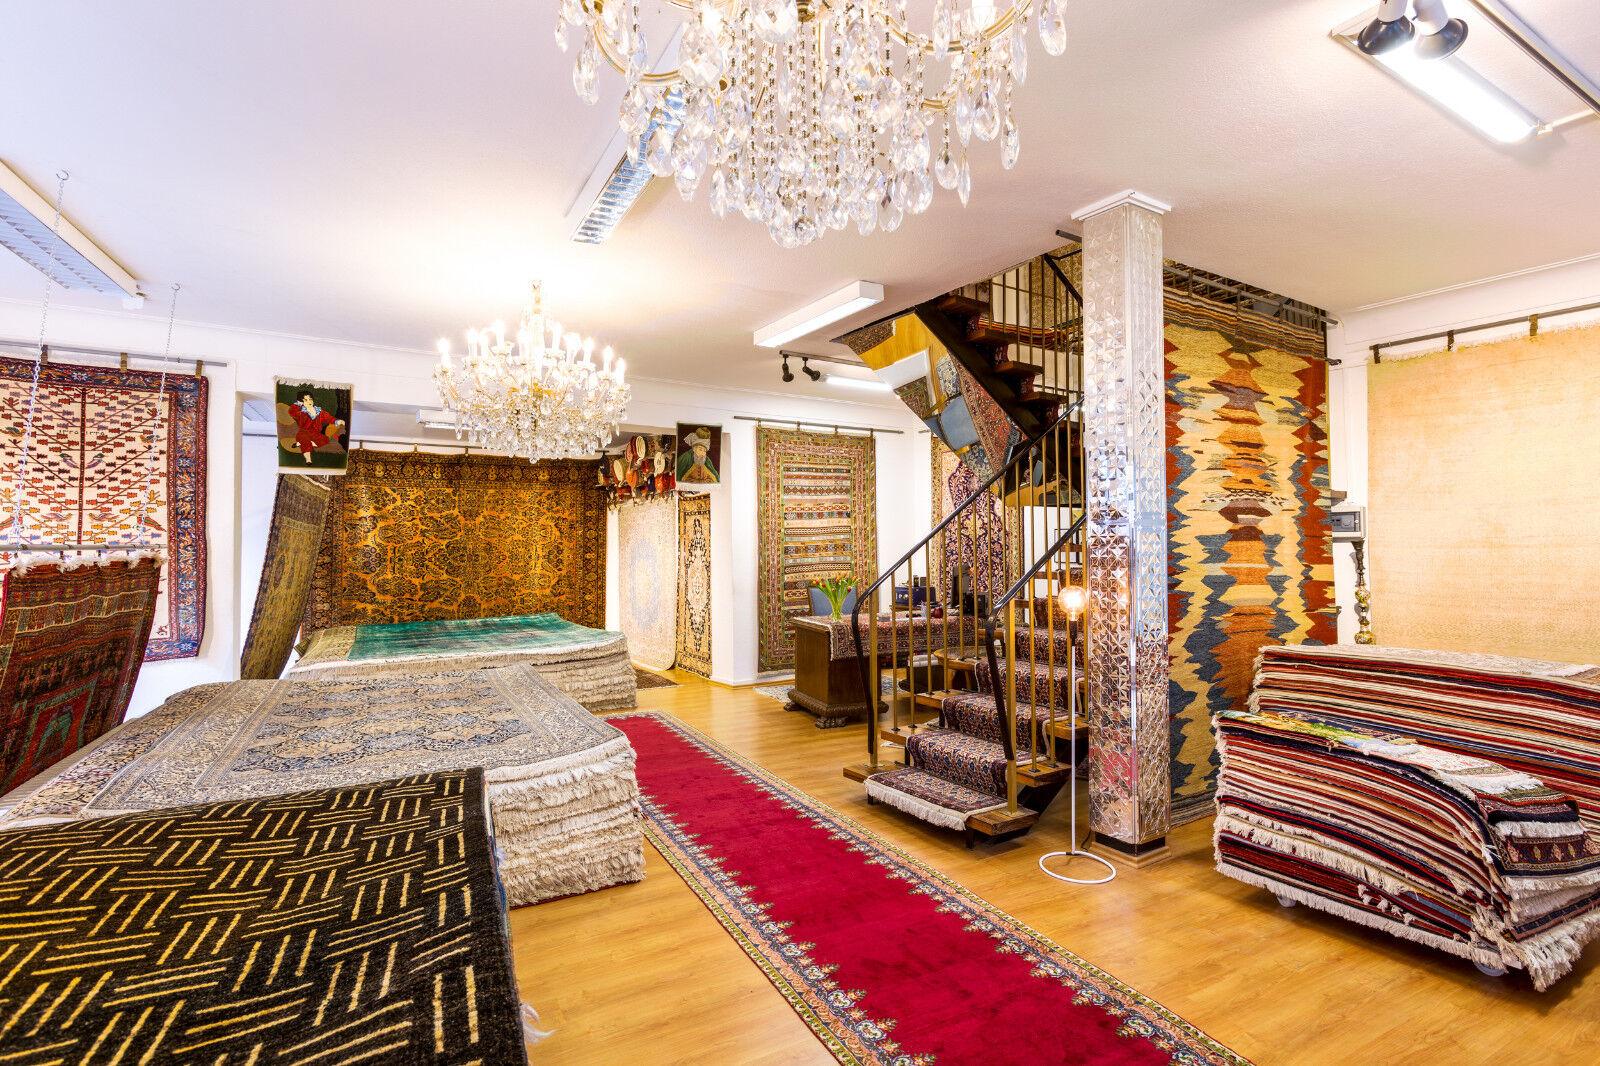 Kashan Teppich Orientteppich Rug Carpet Carpet Carpet Tapis Tapijt Tappeto Alfombra Art Kunst ceca1a